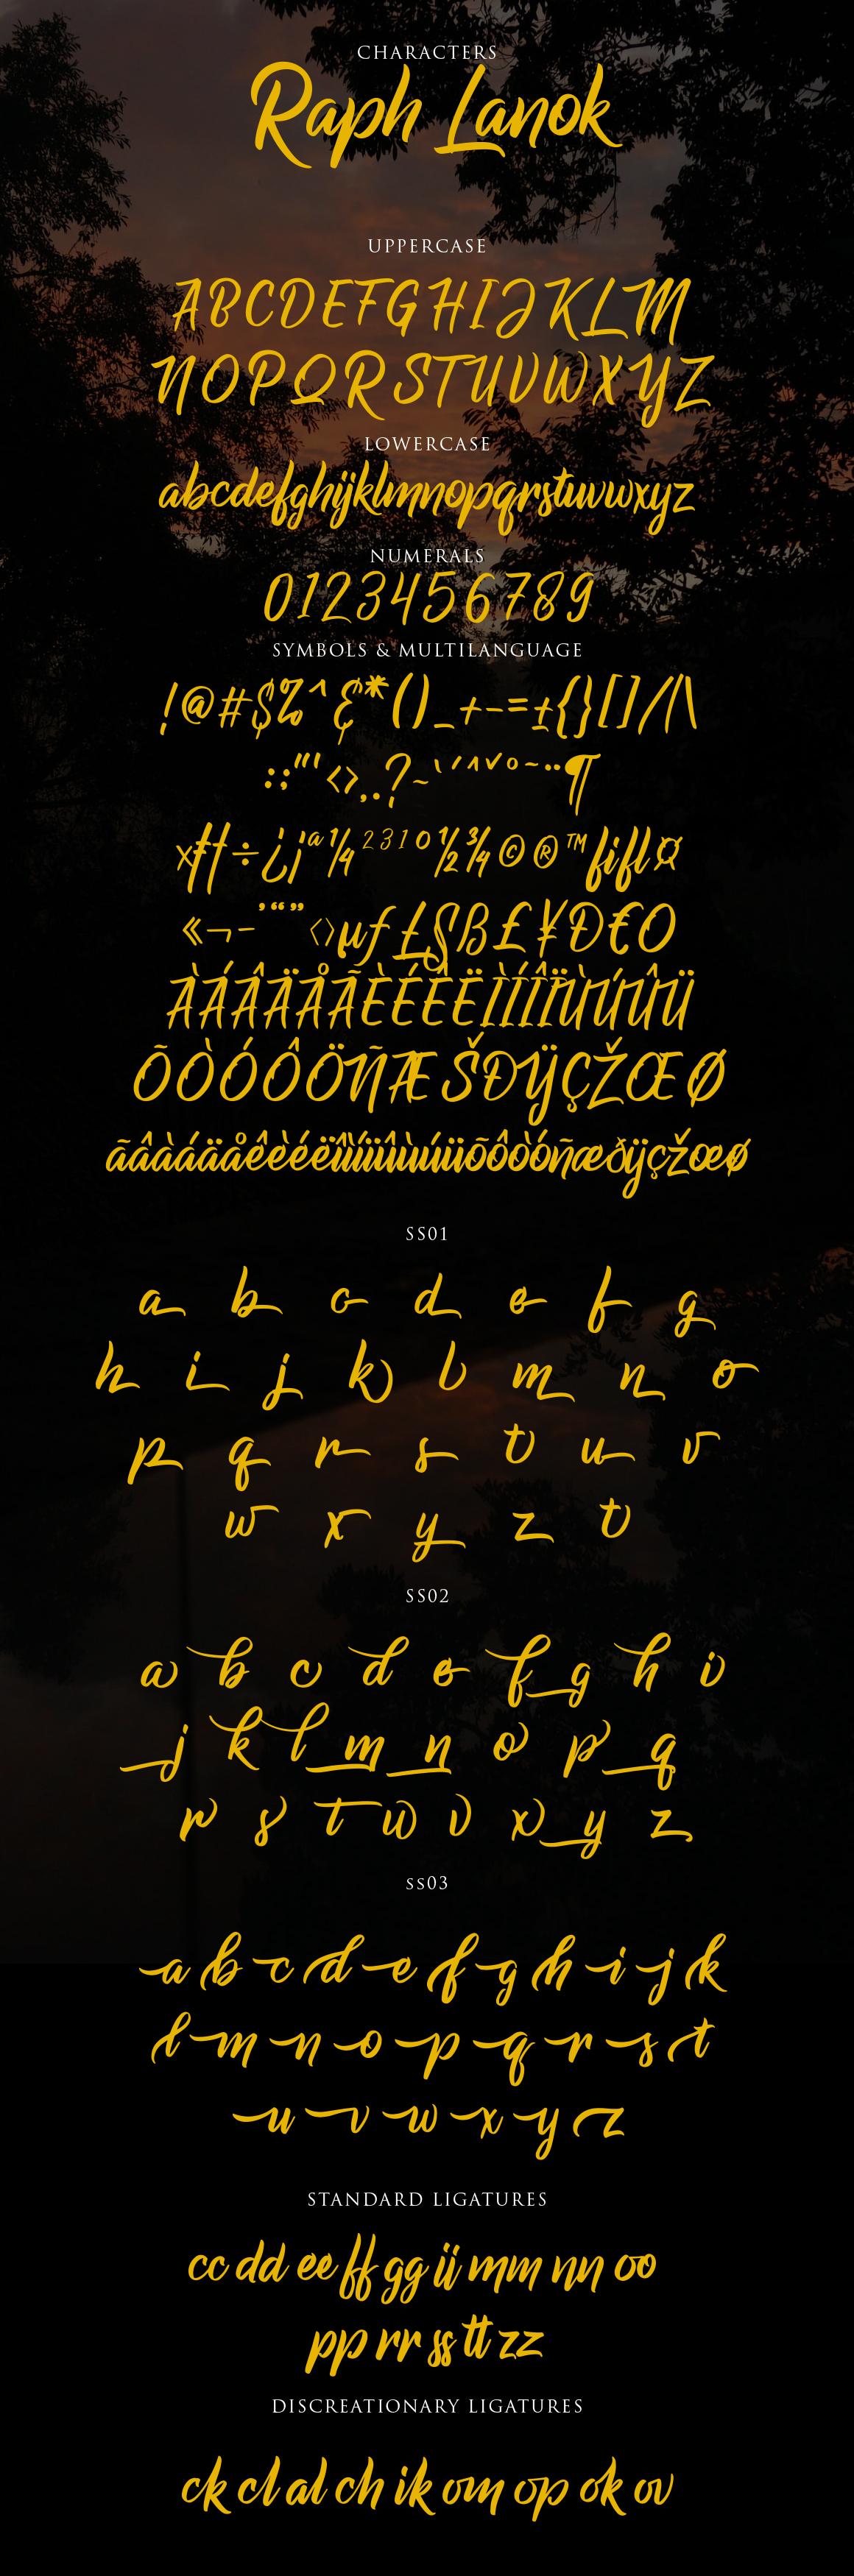 Raph Lanok Typeface example image 3